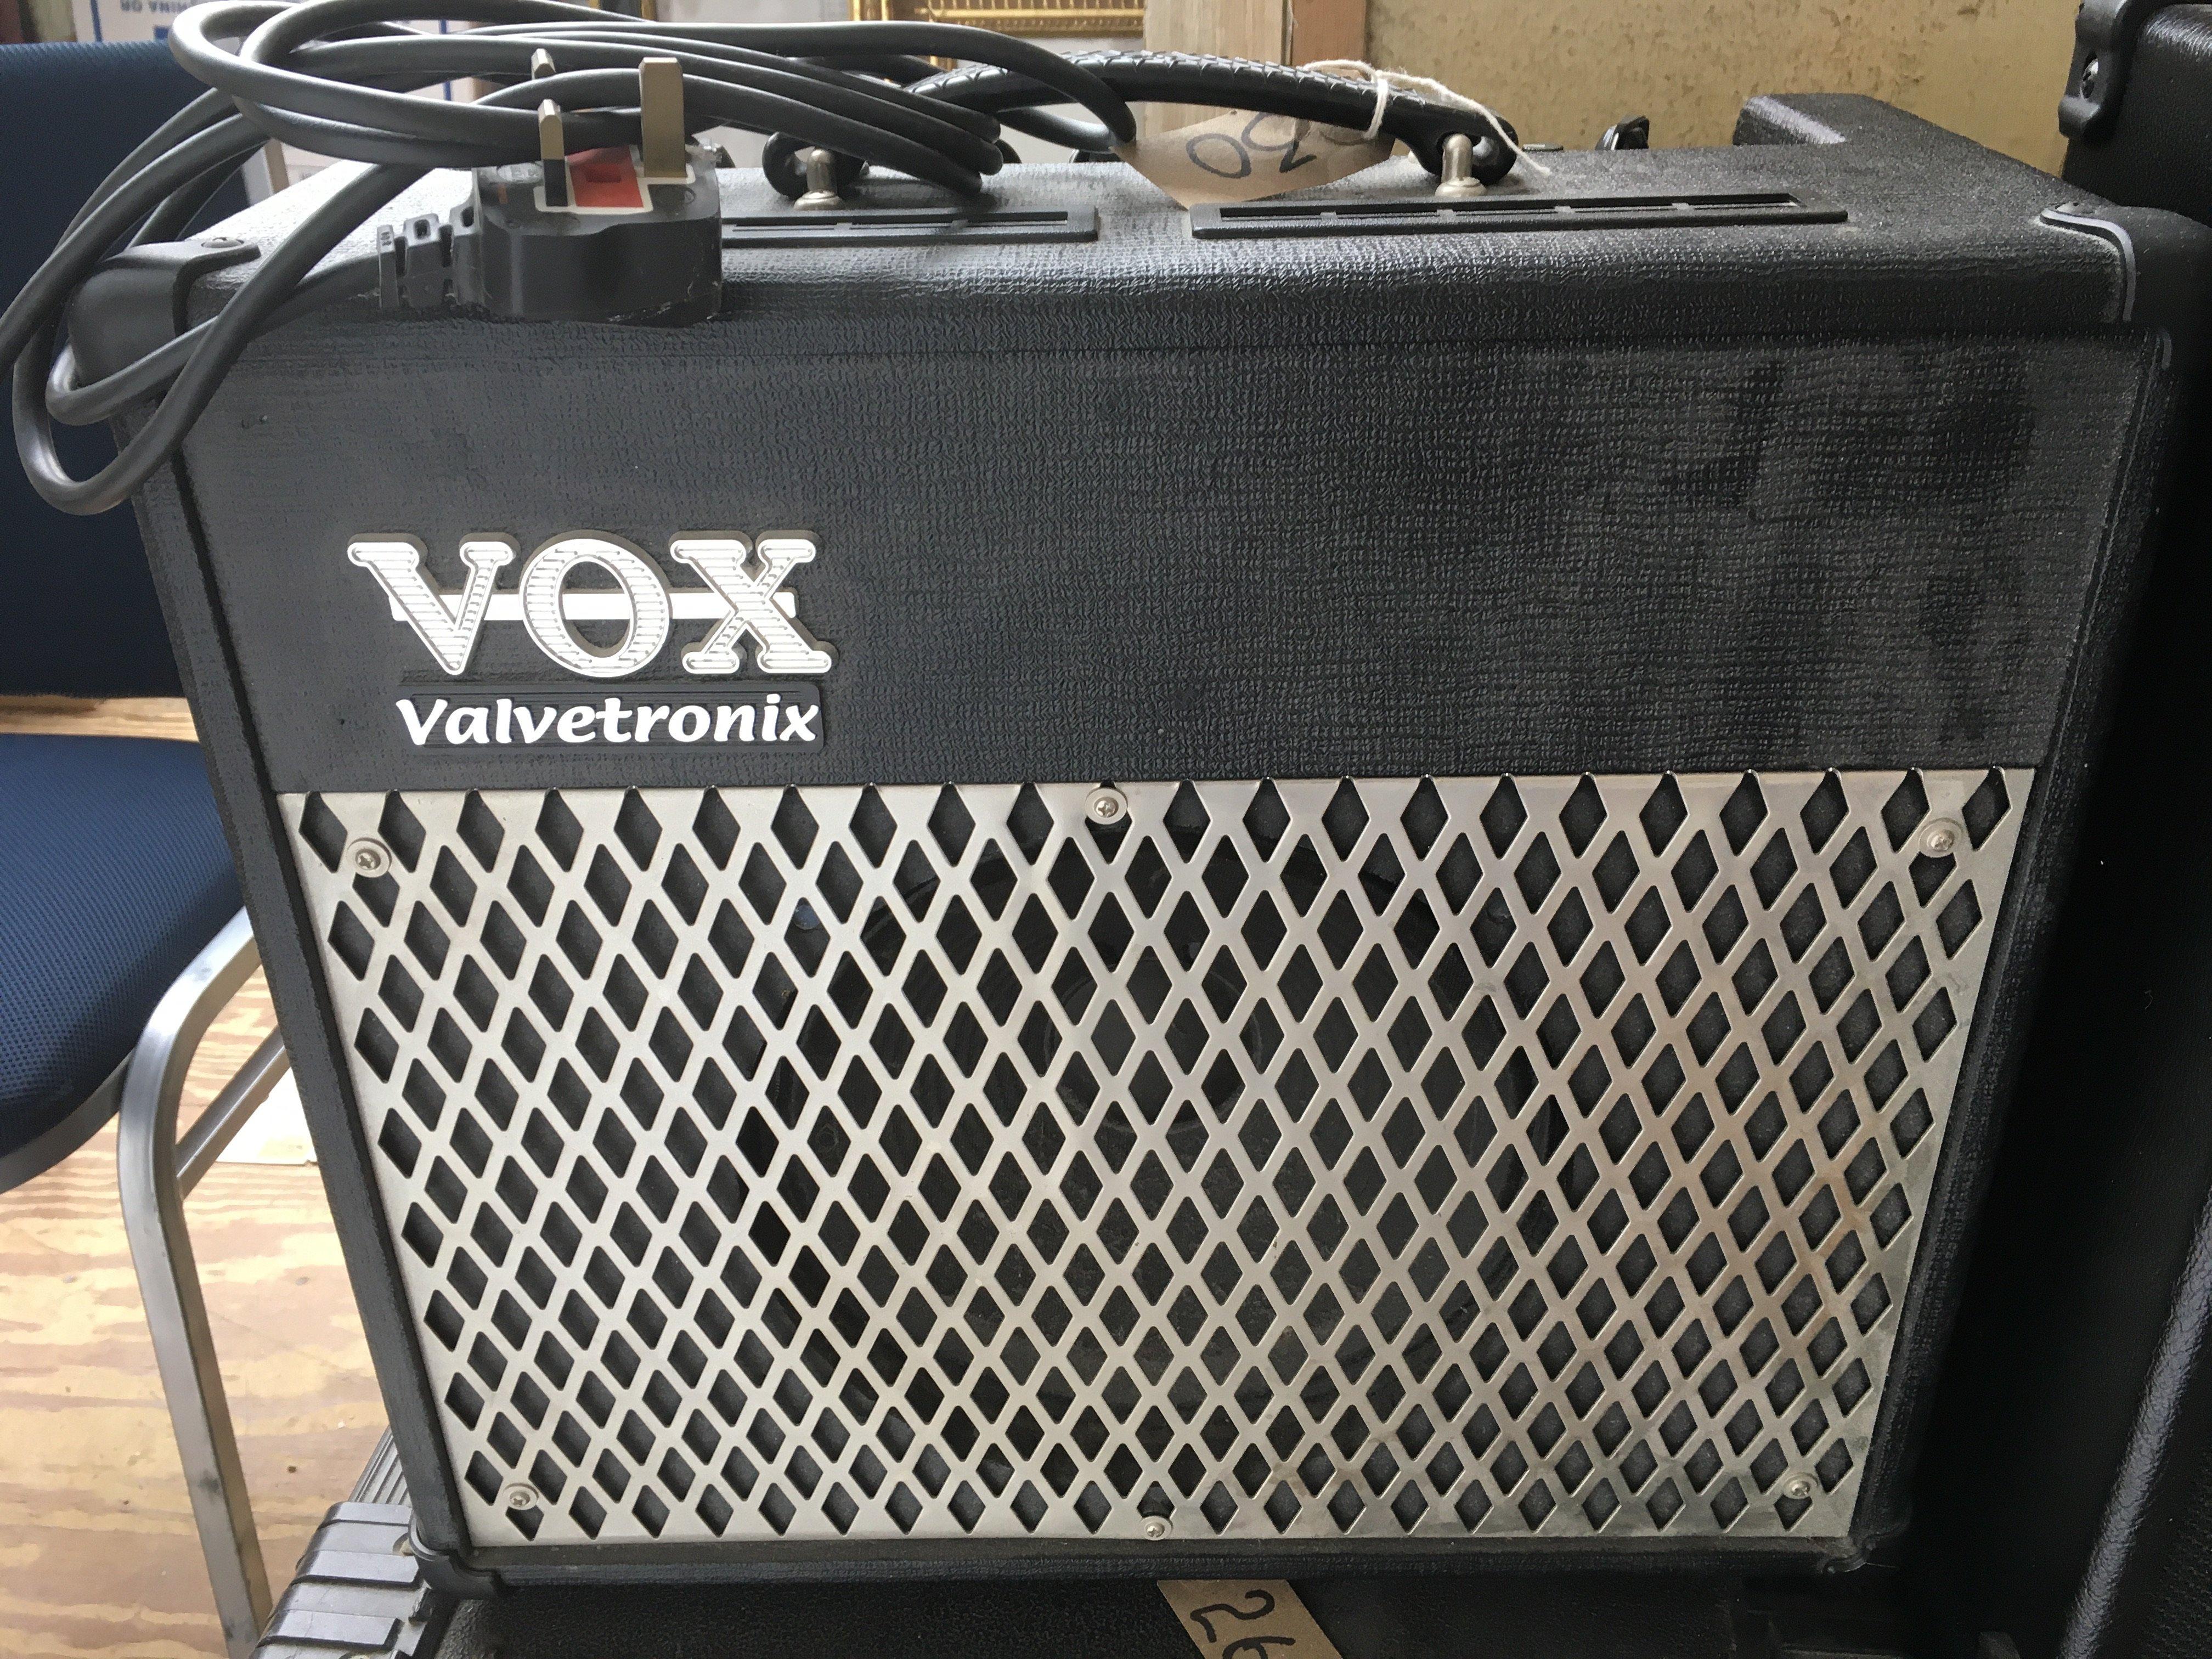 A Vox Valvetronix AD30VT guitar amplifier.